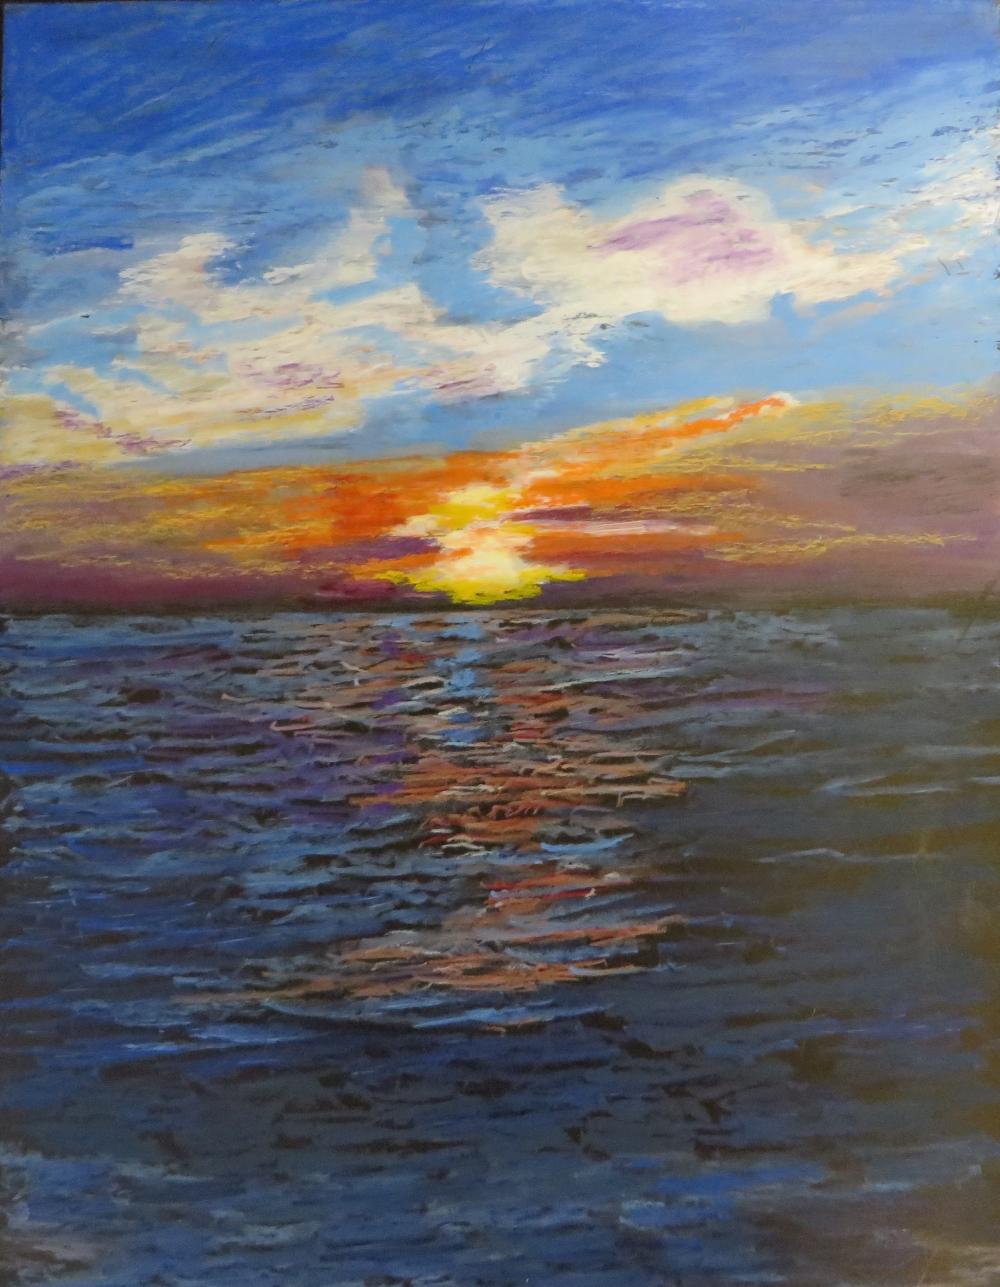 Sunset over Lake Erie; acrylic & oil pastel on artist board, copyright 2017